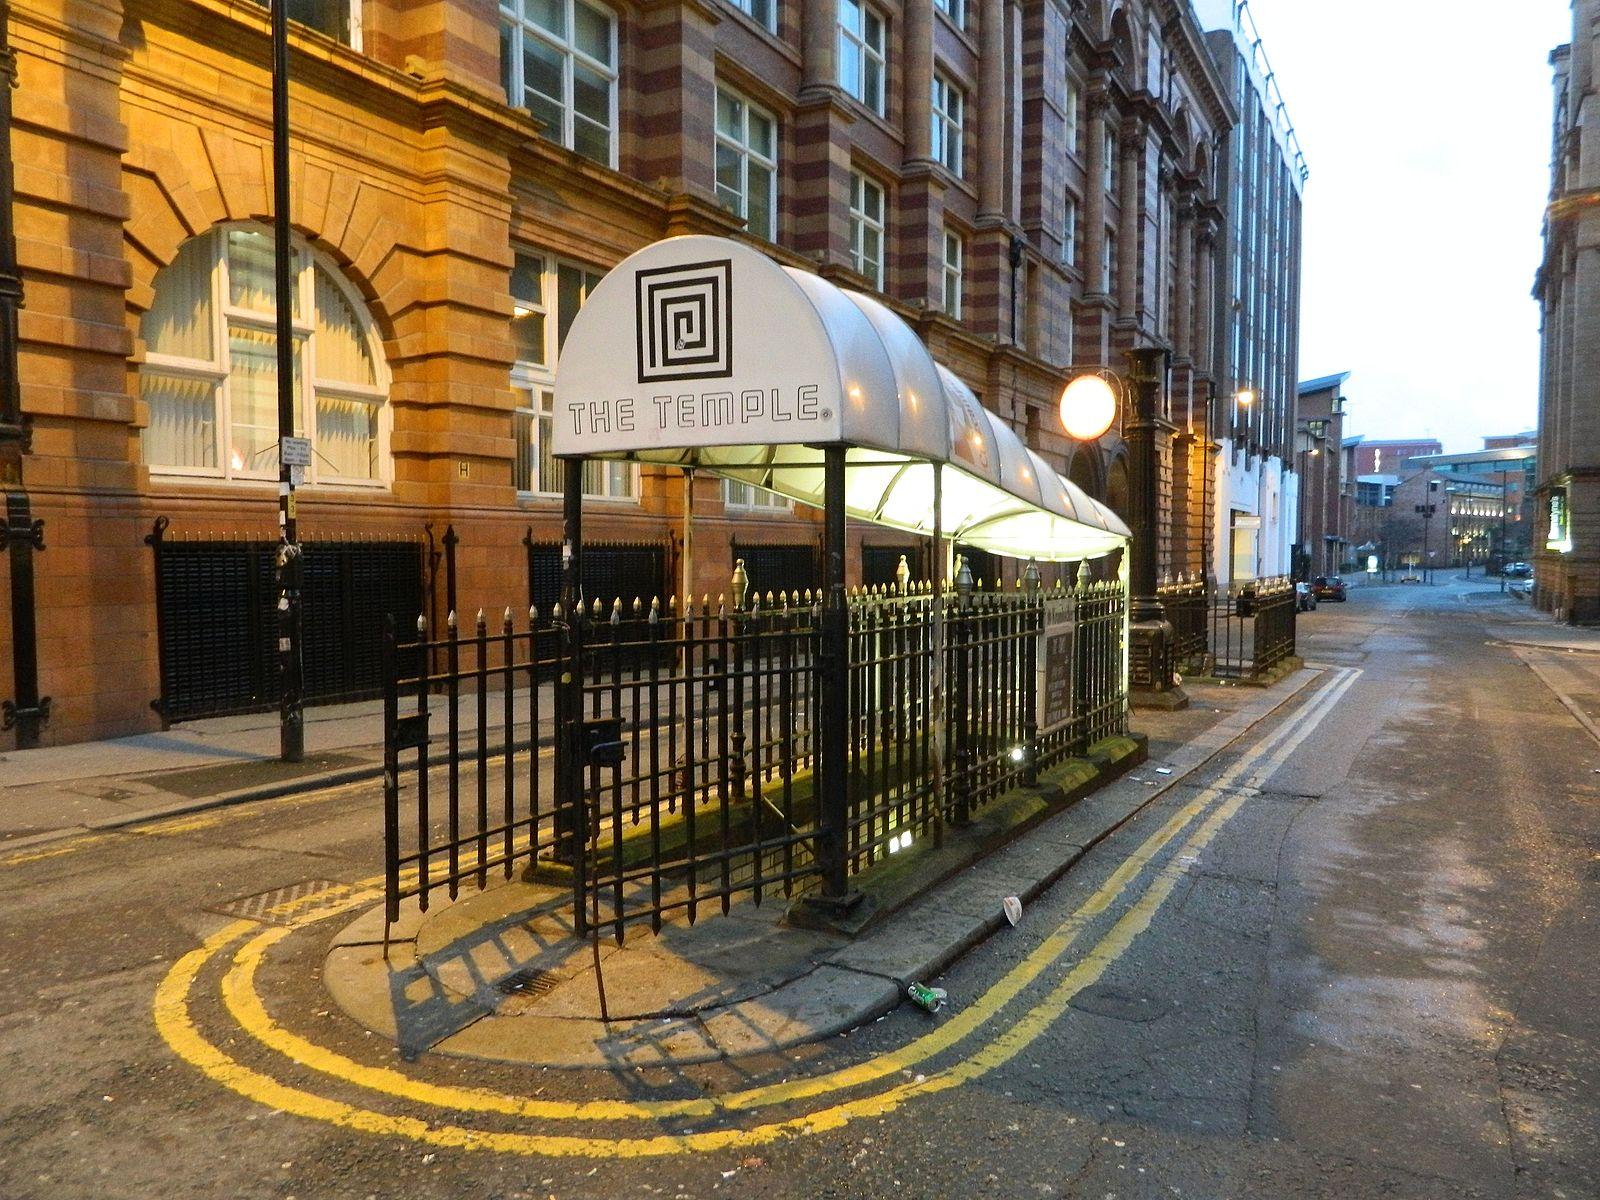 10 of the best 'secret' bars hidden in Manchester, The Manc